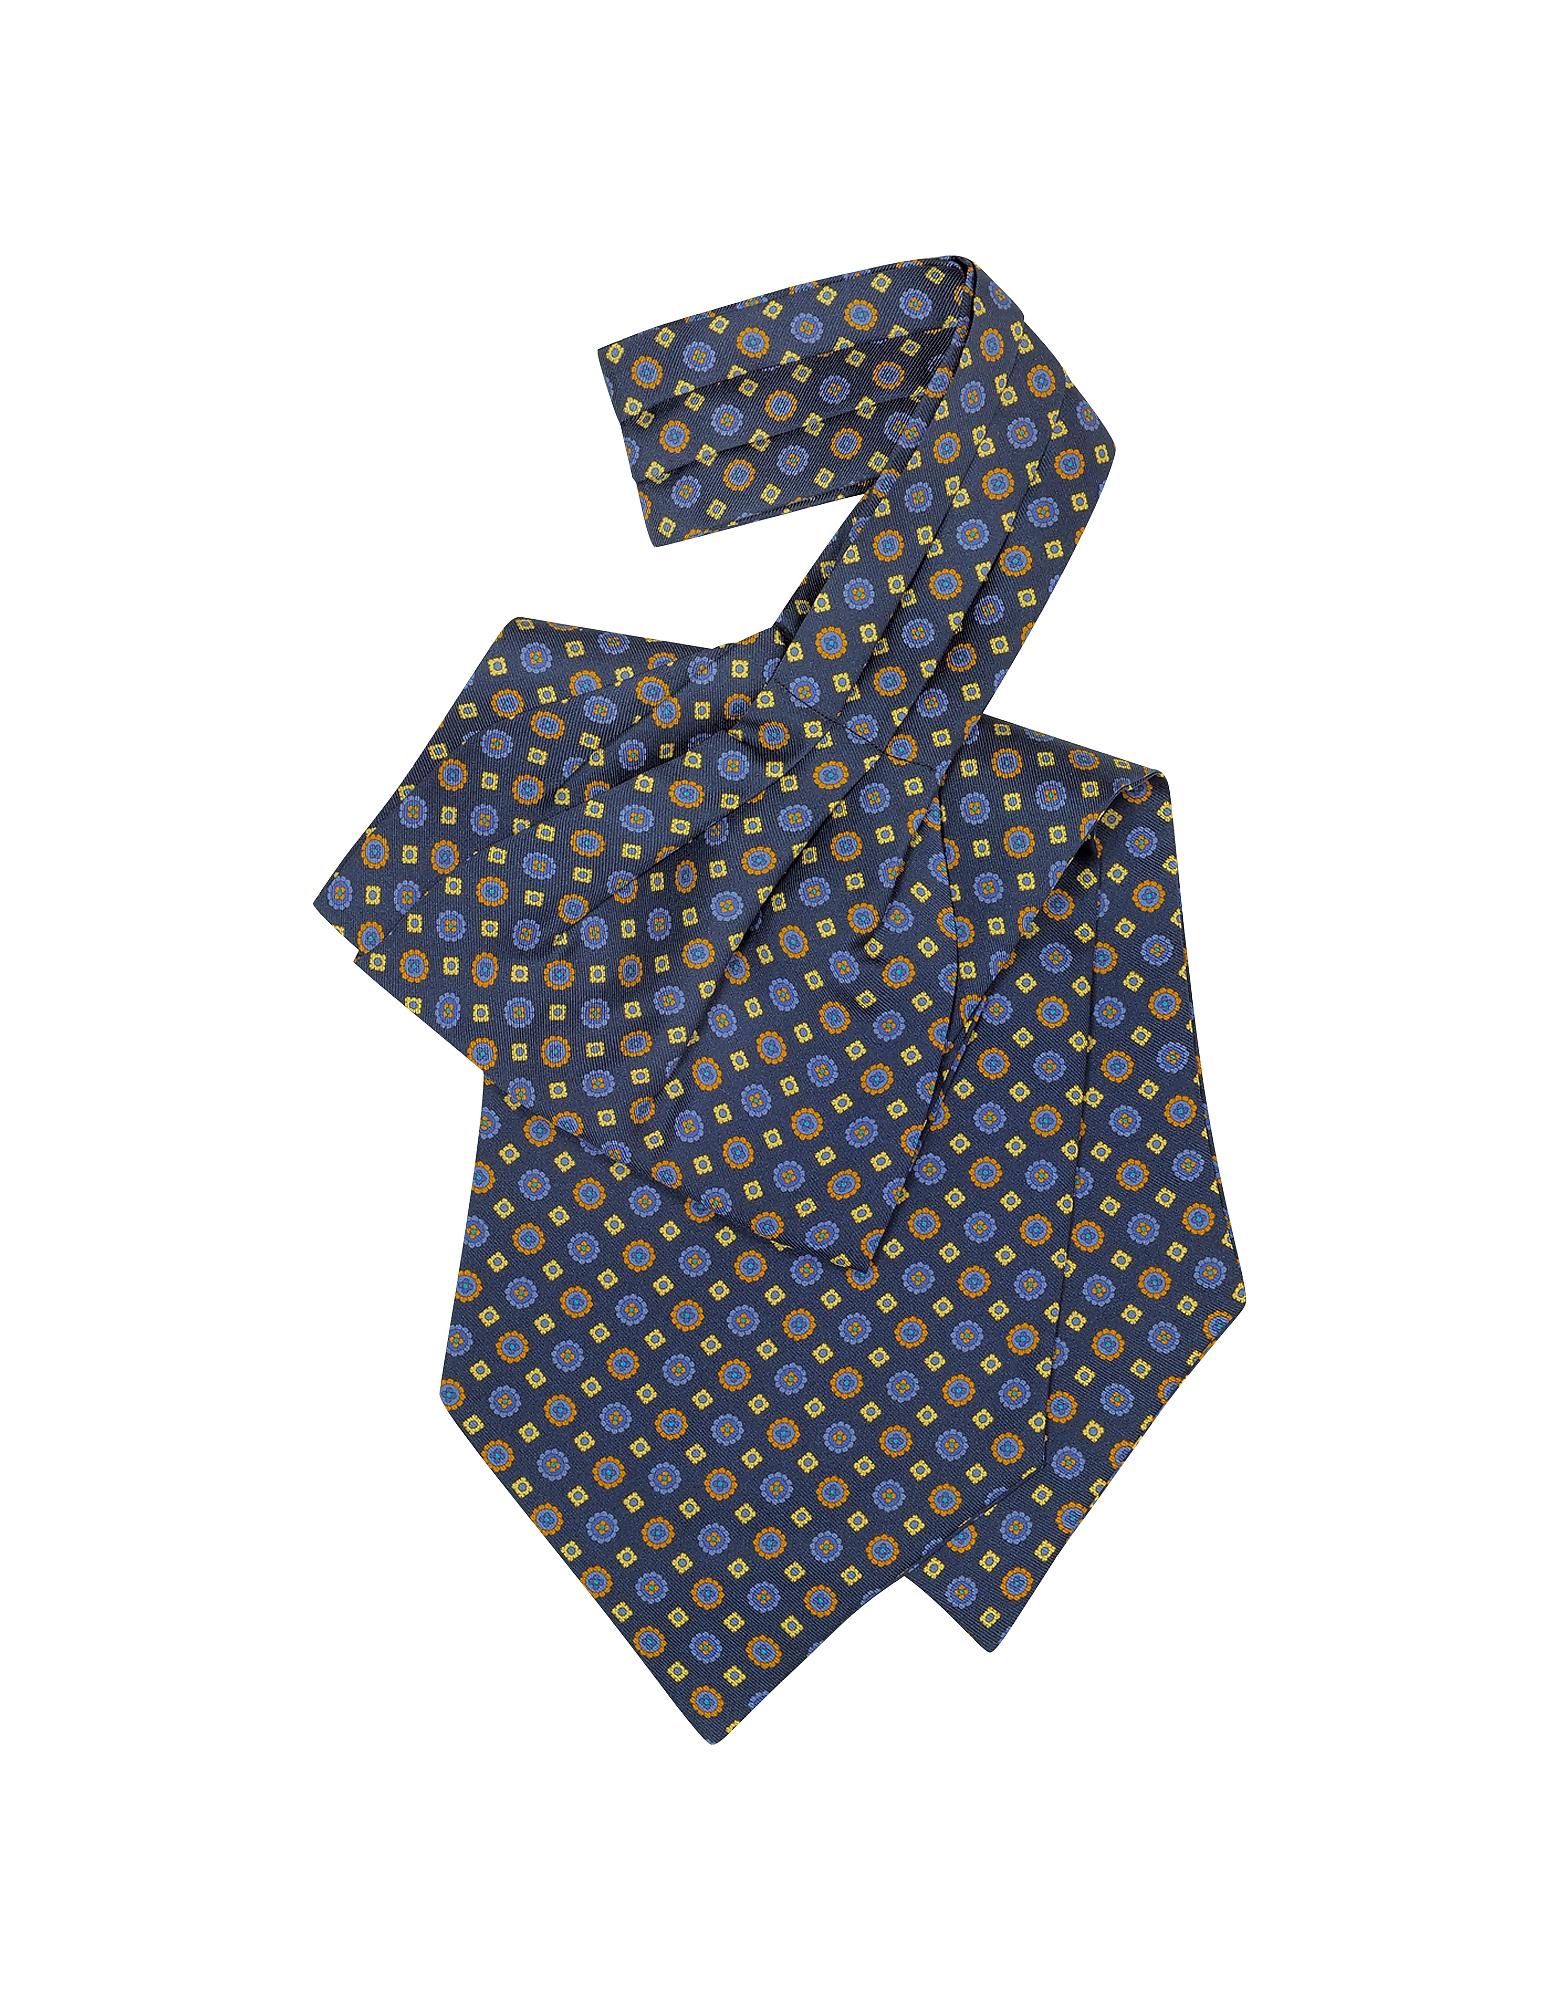 Image of Forzieri Designer Ascot ties, Floral Print Silk Tie Ascot